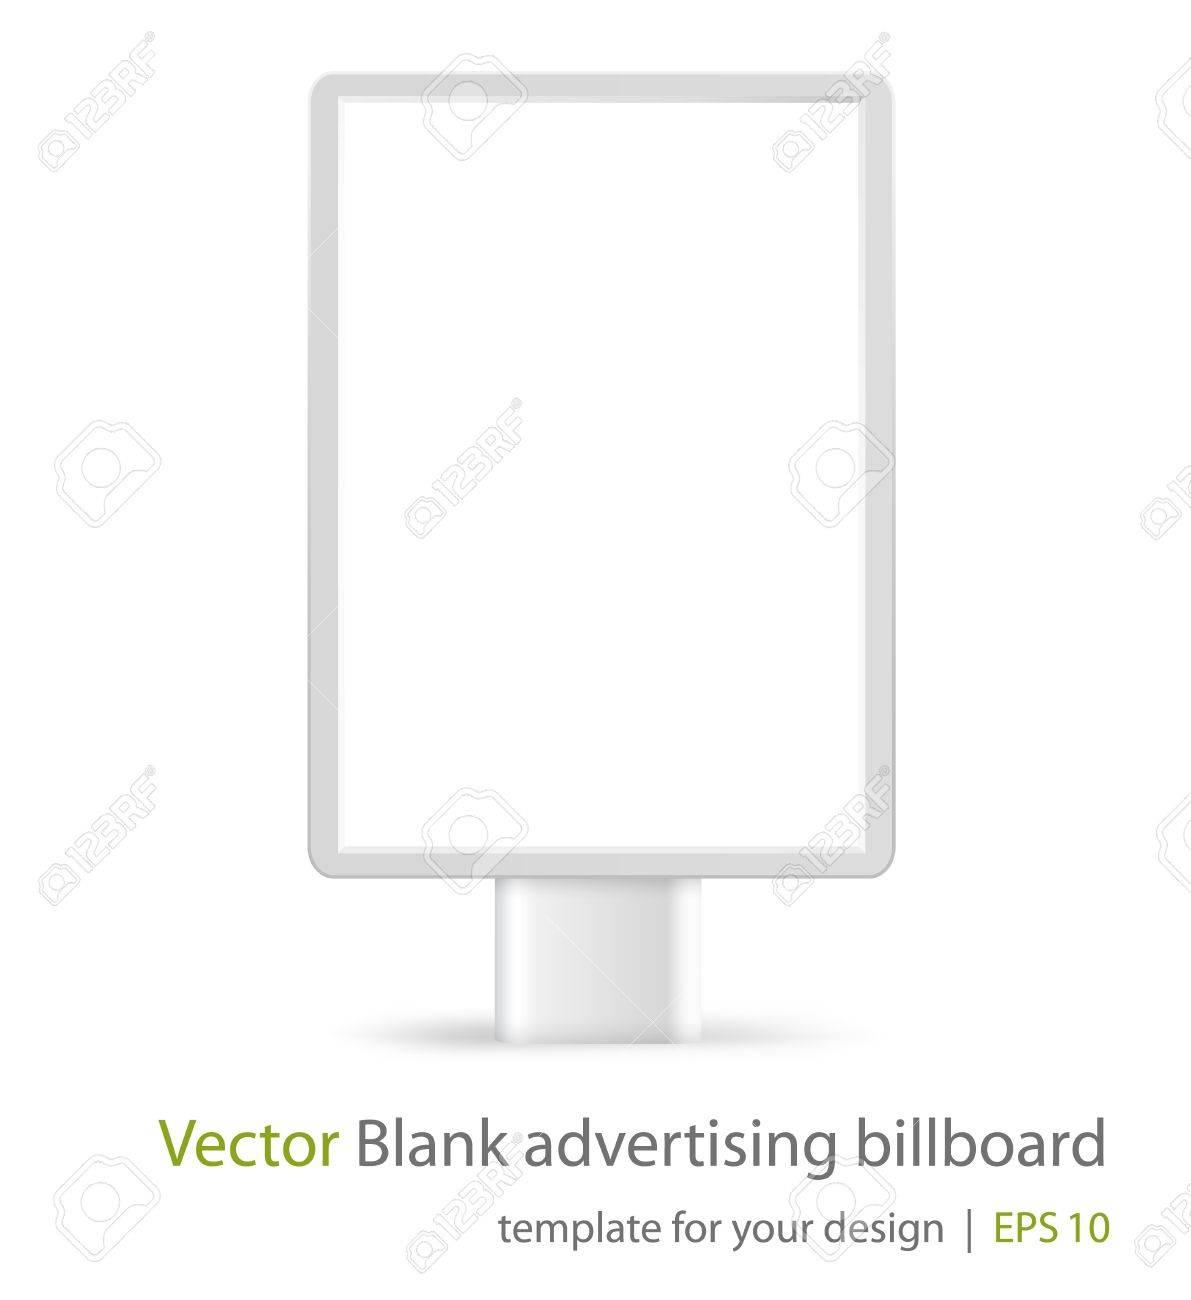 Vector blank advertising billboard on white background Eps10 - 12890393